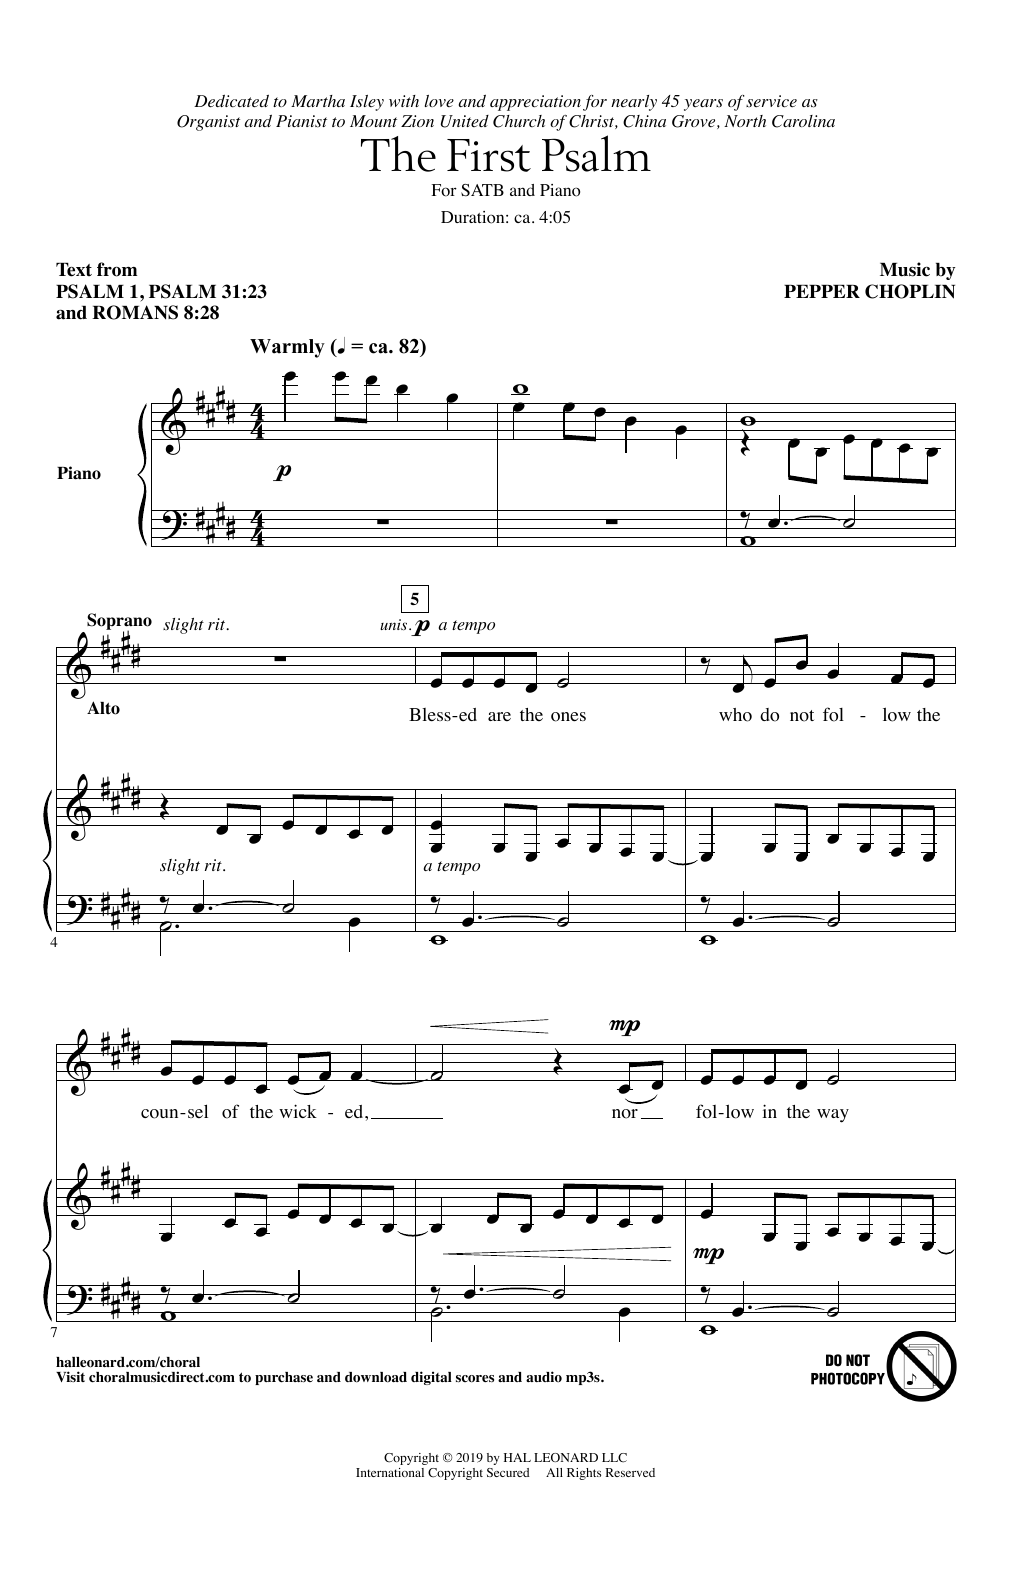 The First Psalm (SATB Choir)